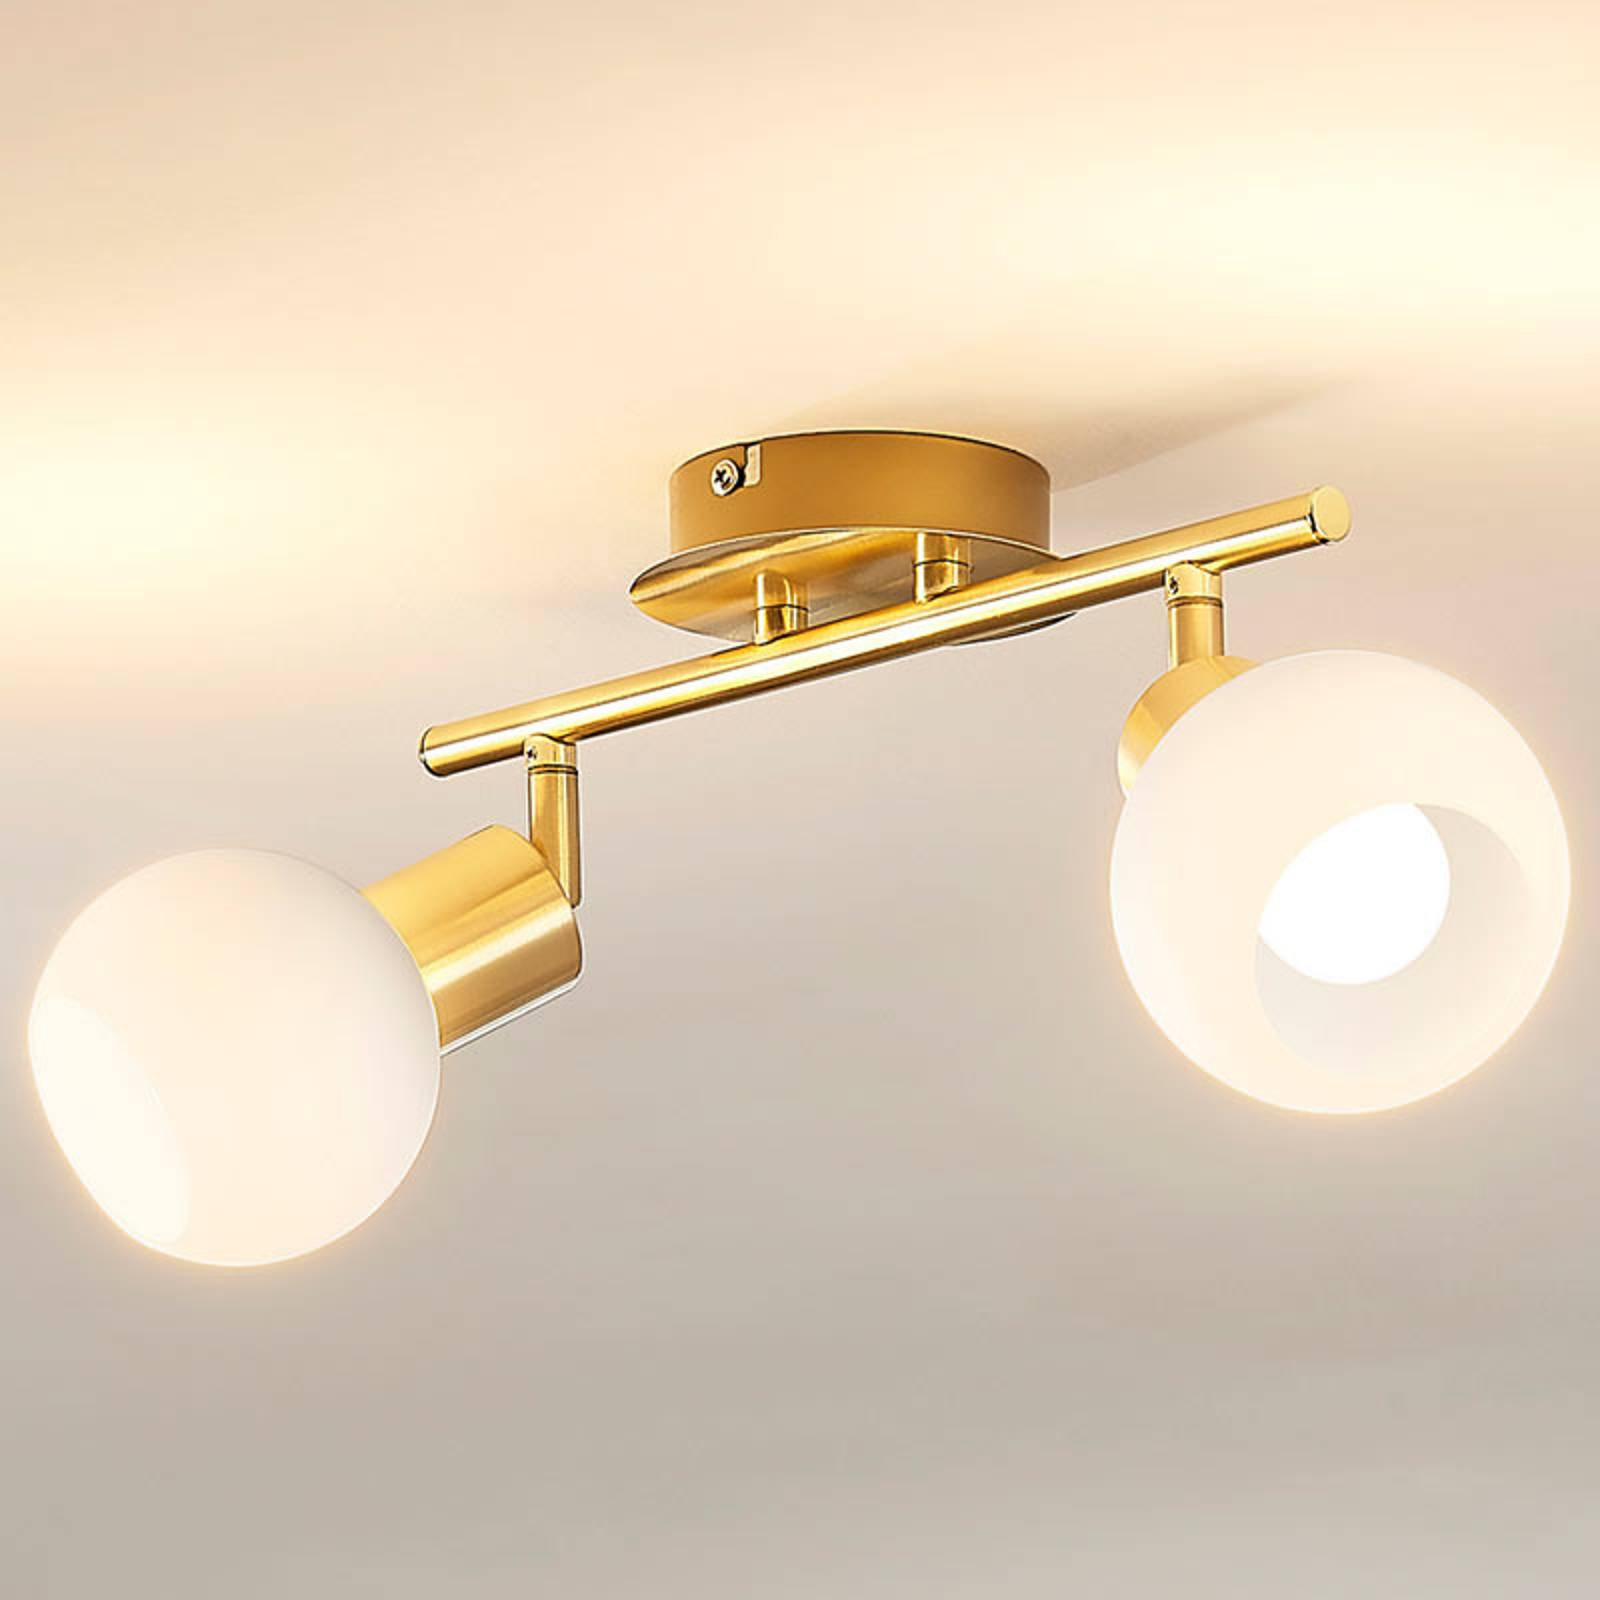 Lampa sufitowa ELAINA z żarówkami LED E14, mosiądz